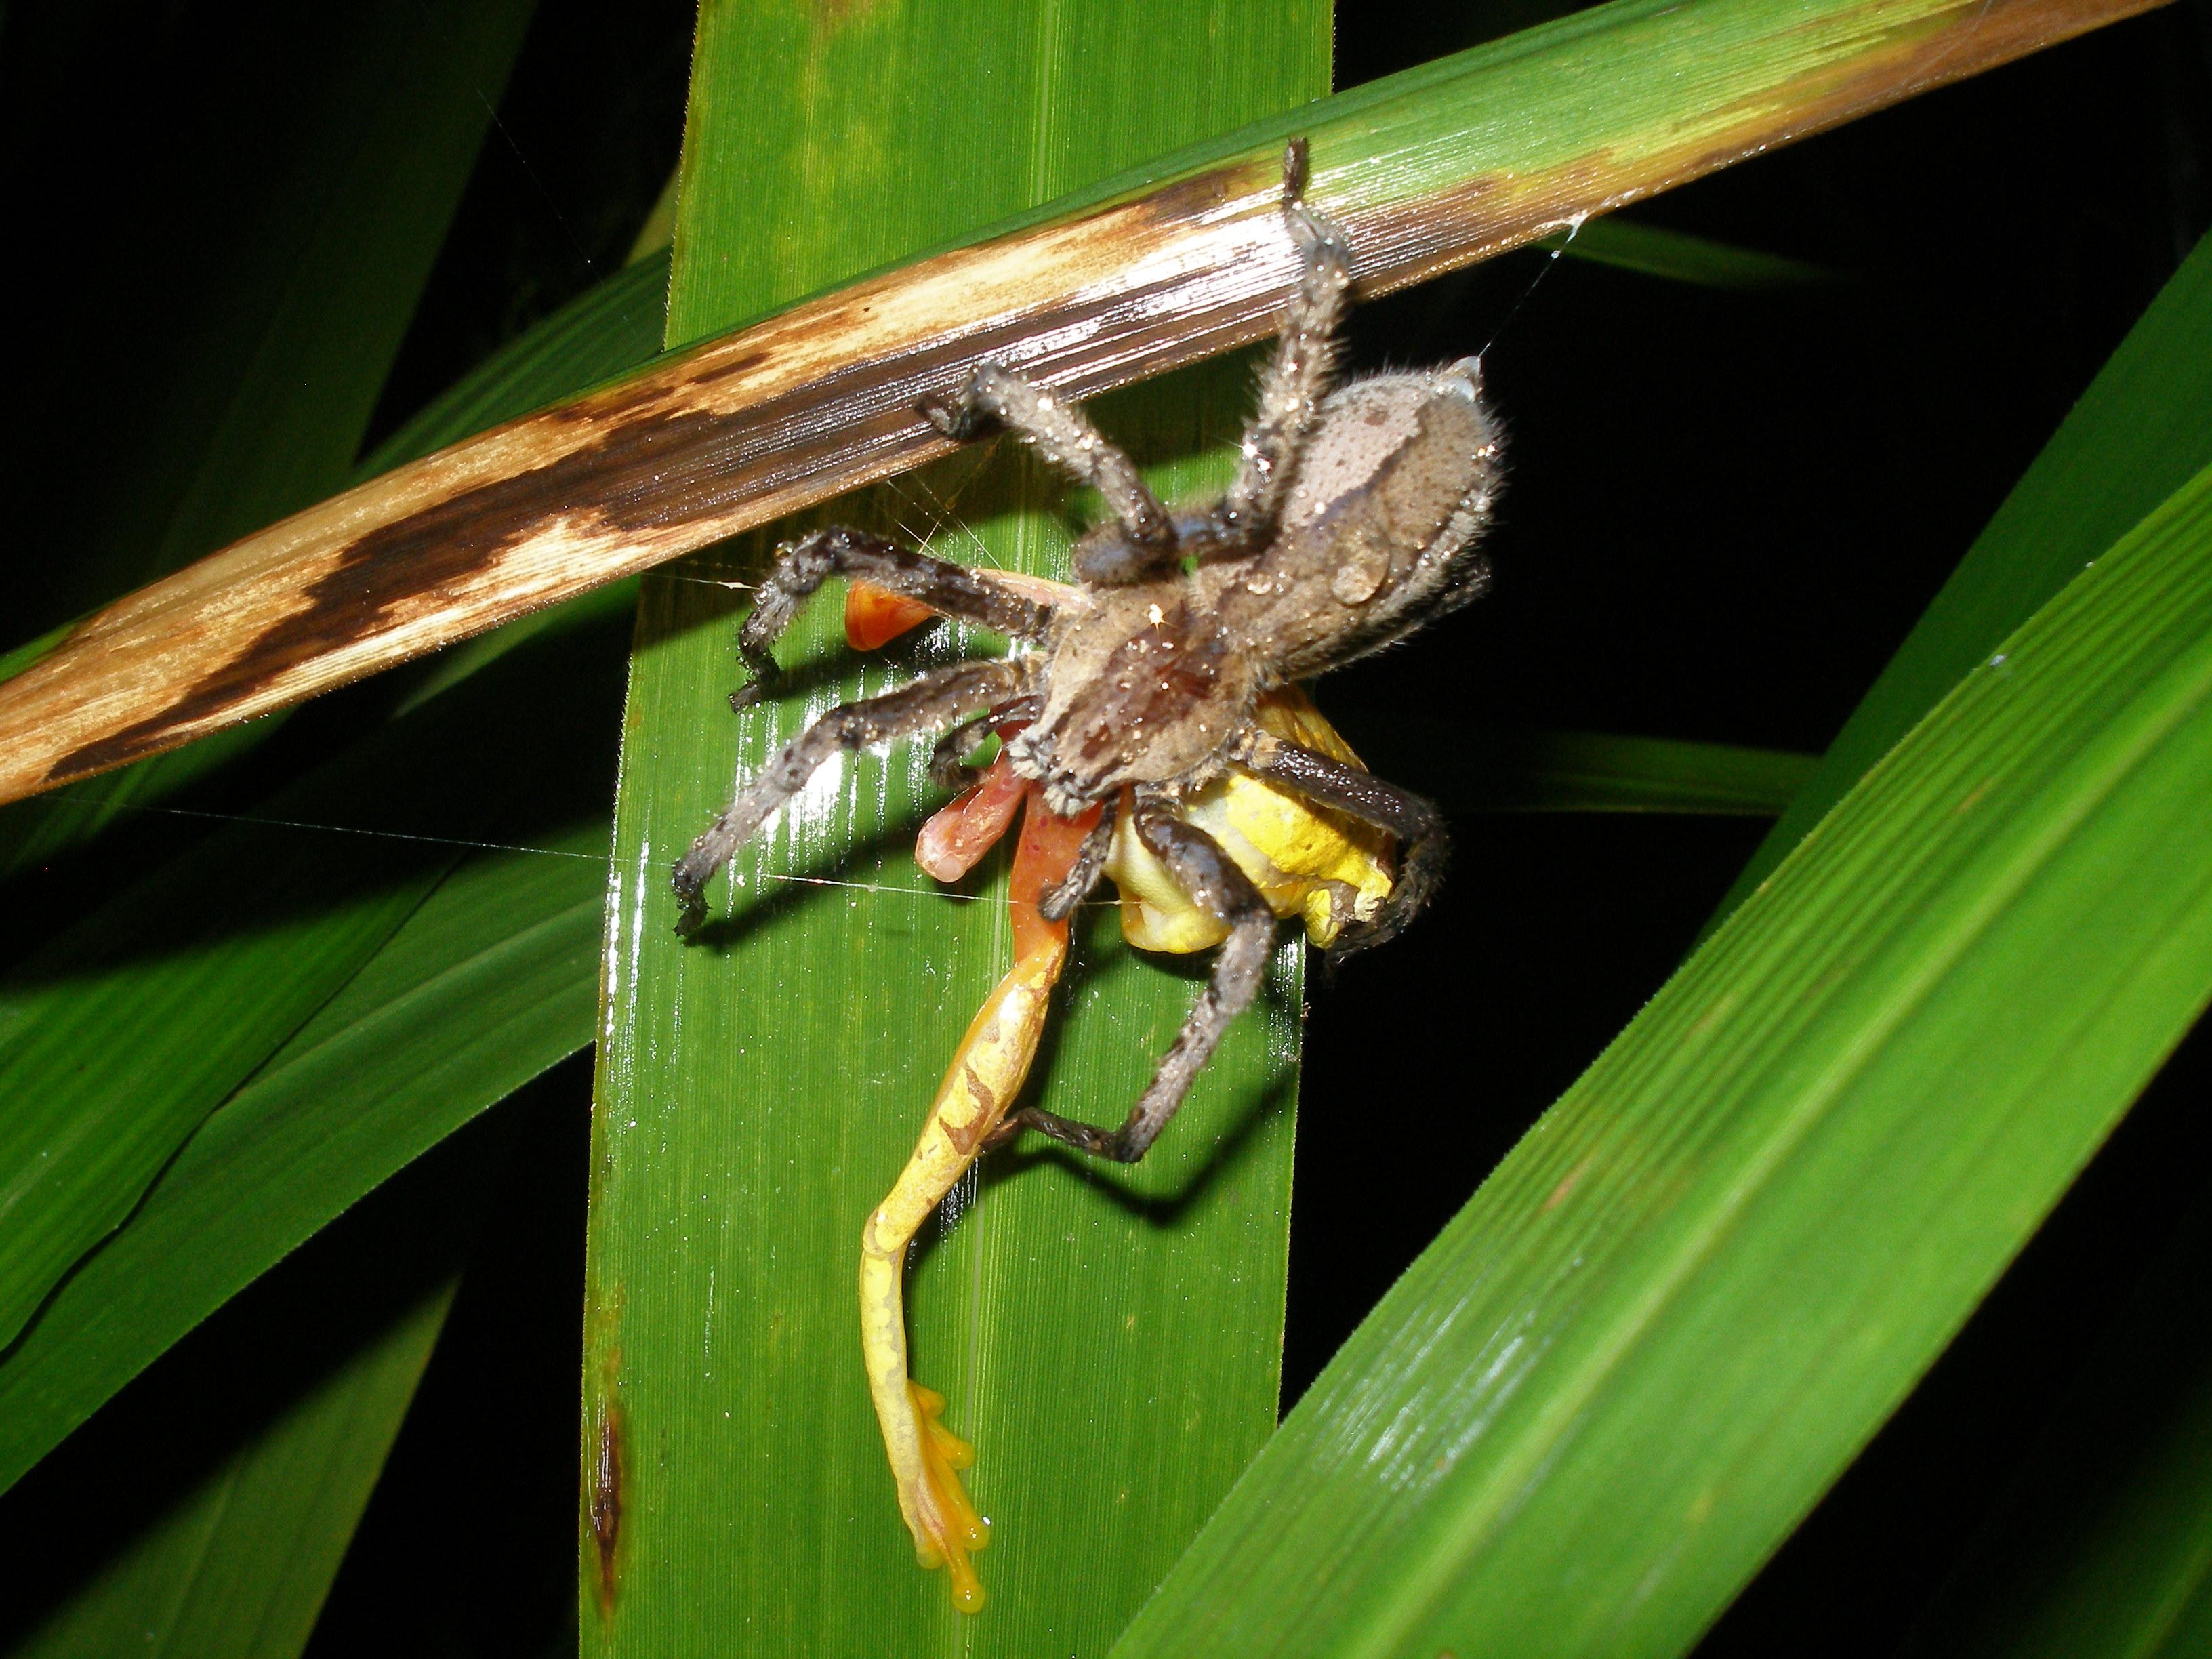 Dendropsophus ebraccatus being eaten by spider